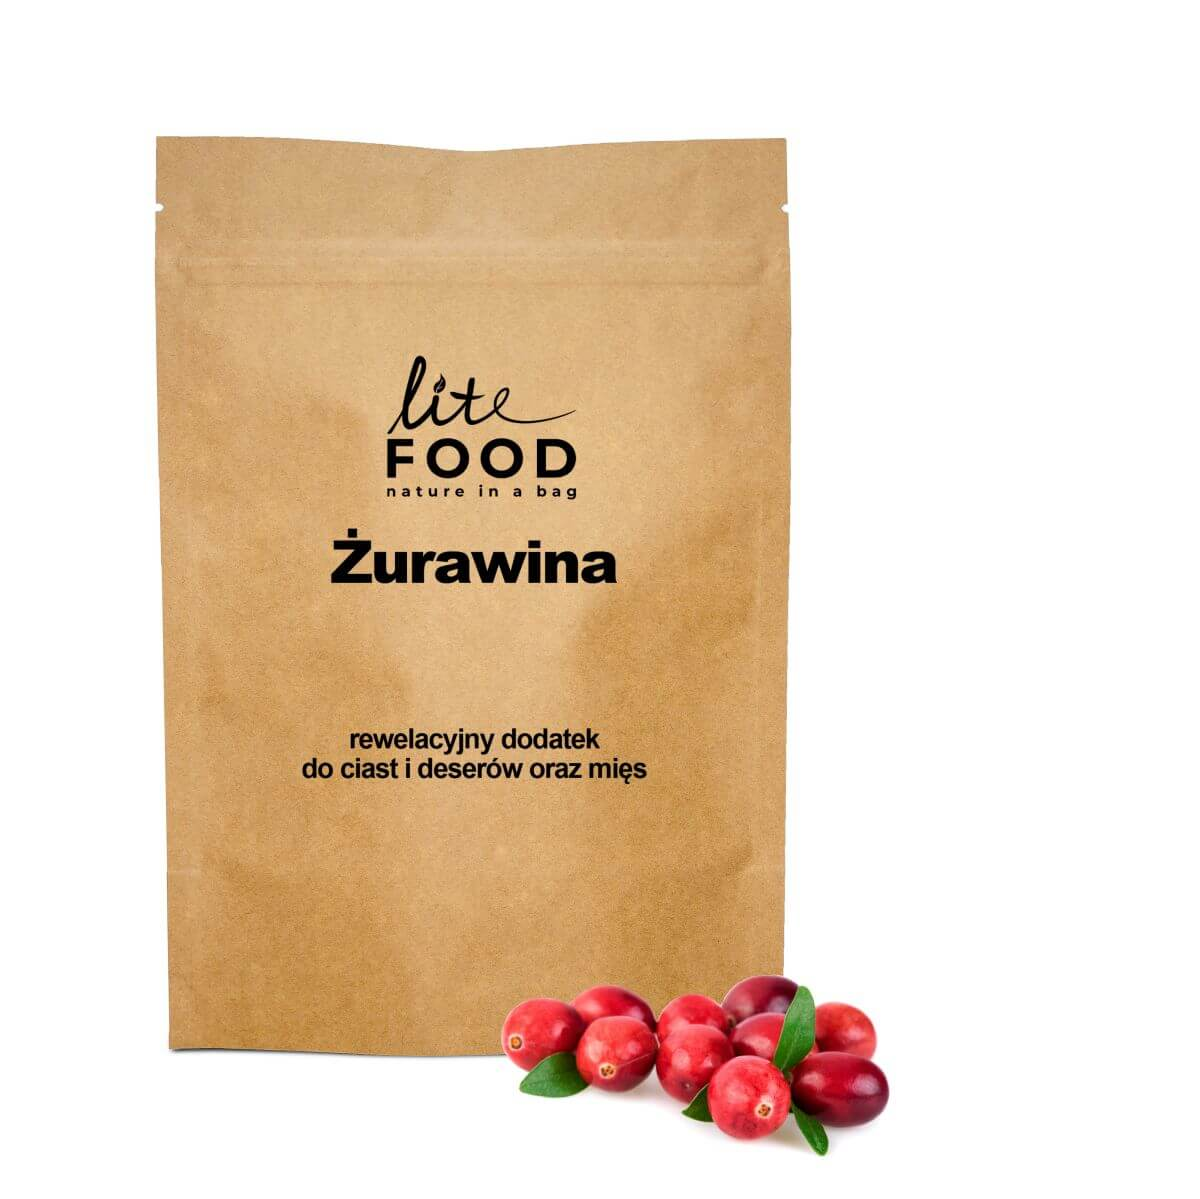 zurawina_1200